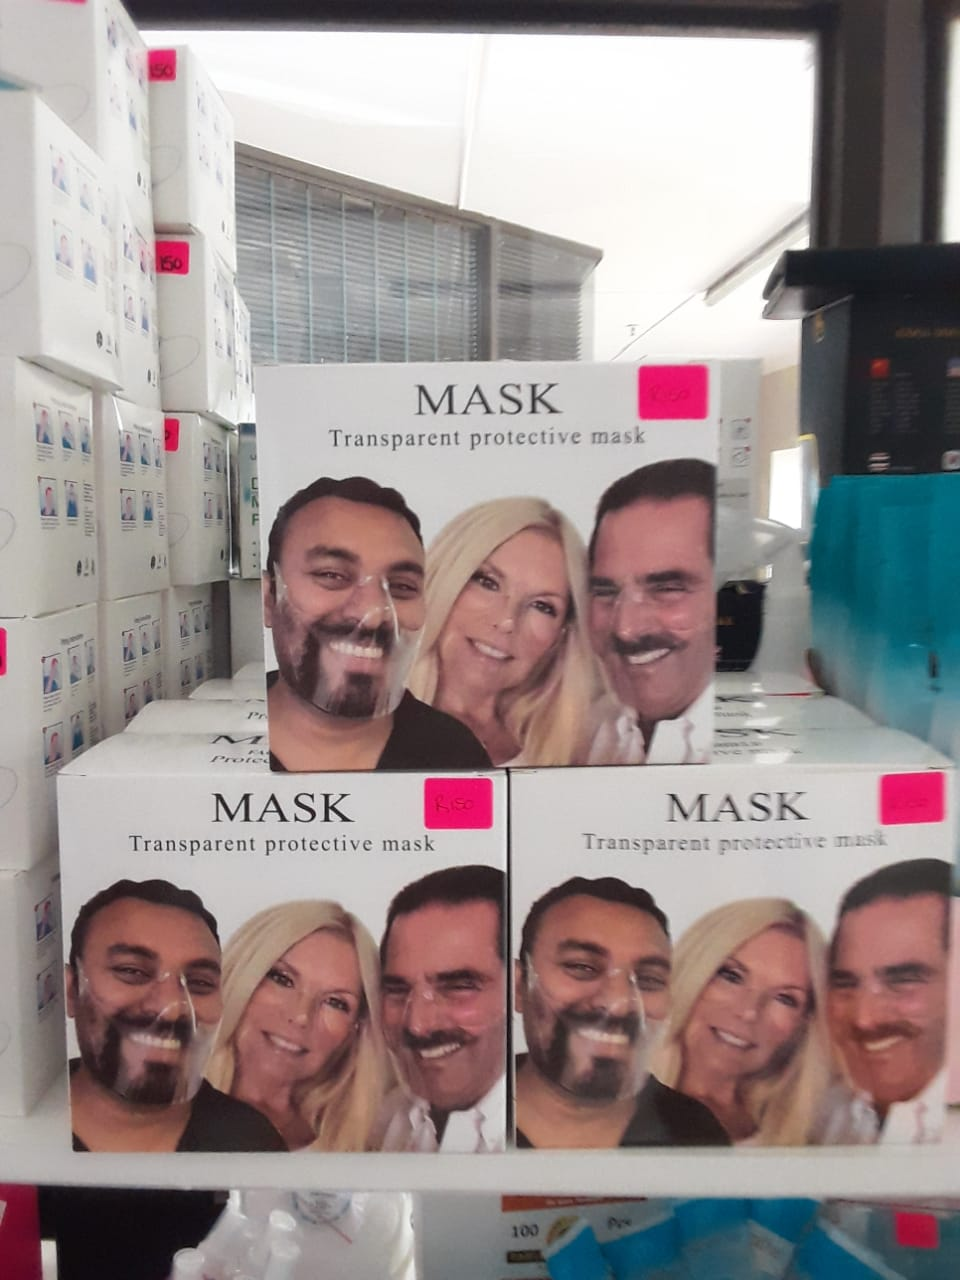 Transparent Protective Masks Clearance Sale